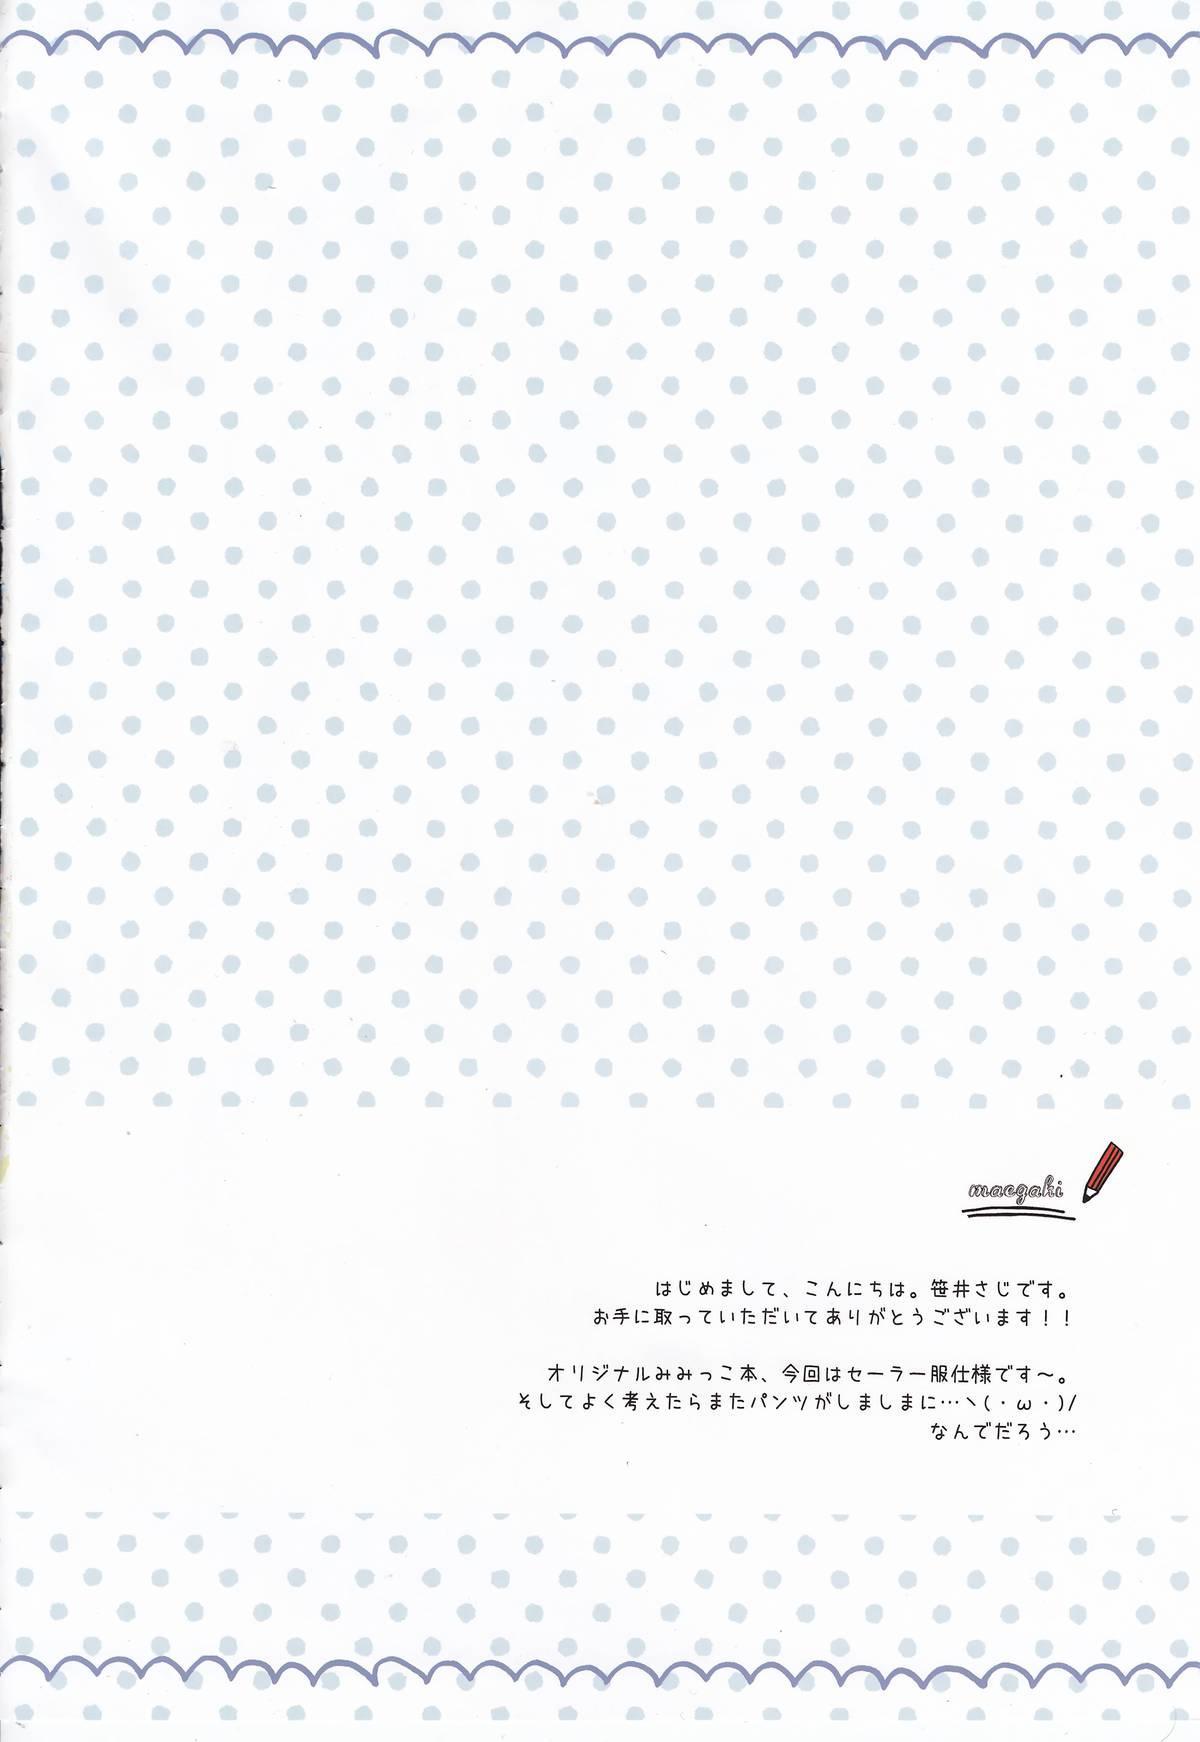 Natsuiro Collage 2